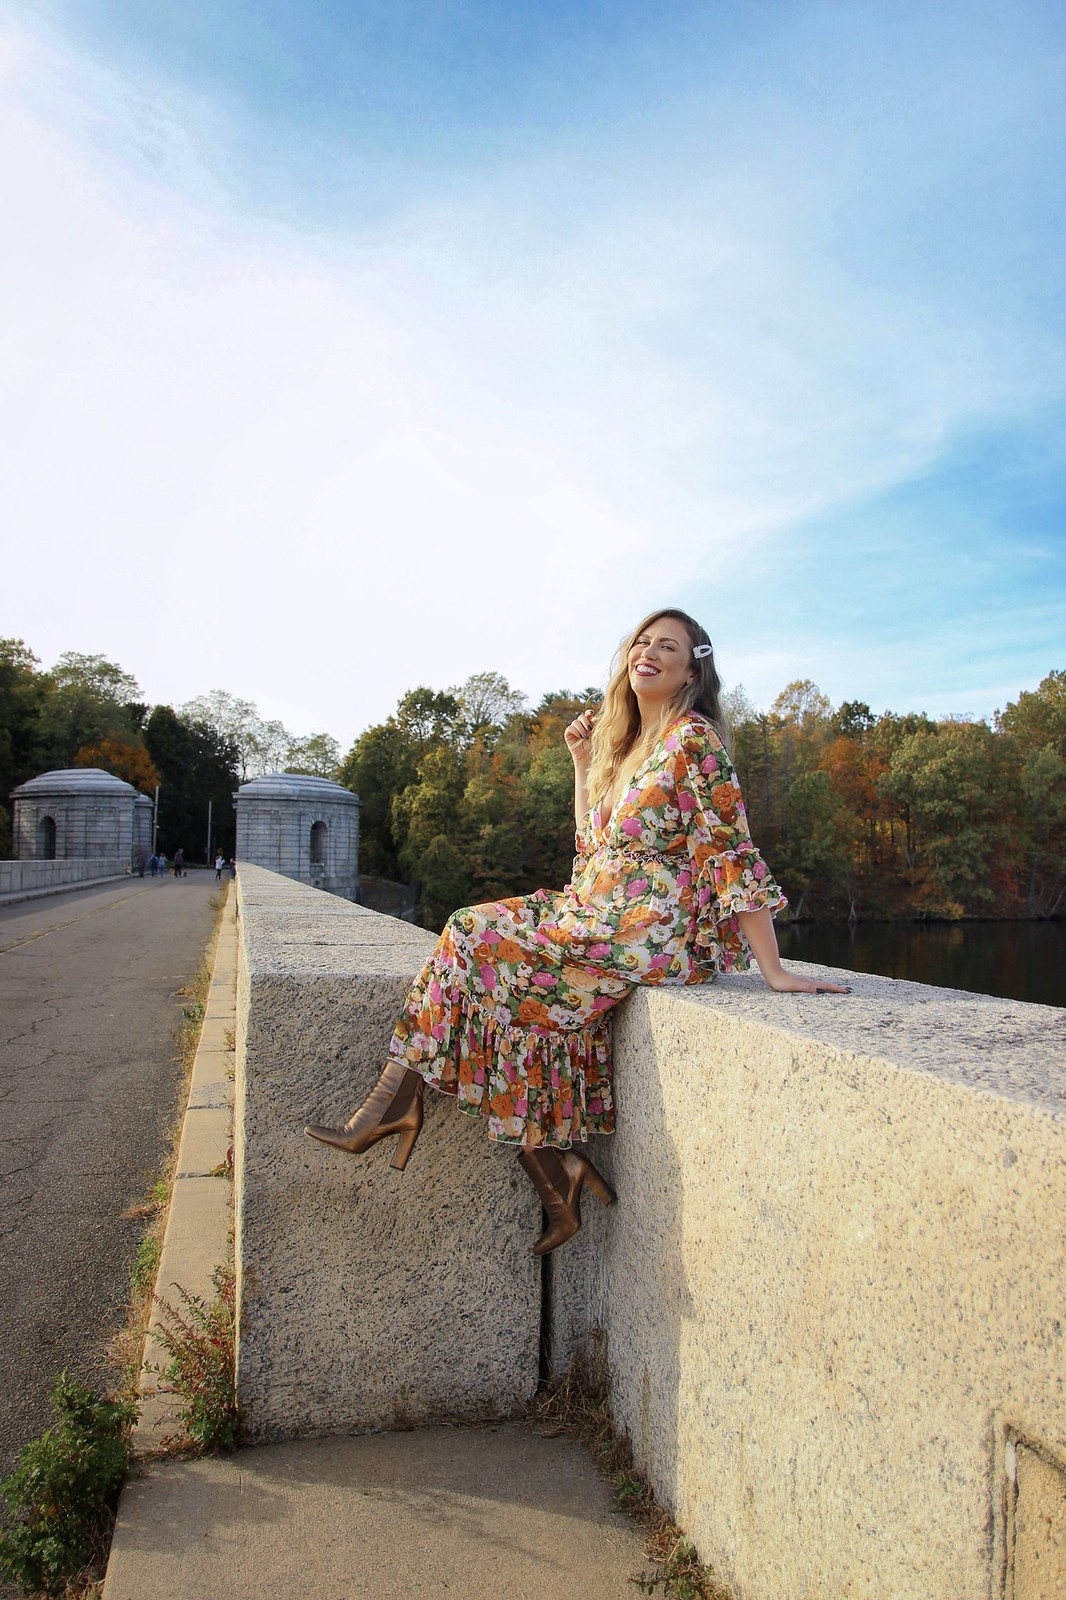 Best Photo Spots in Westchester County Kensico Dam Plaza Valhalla New York